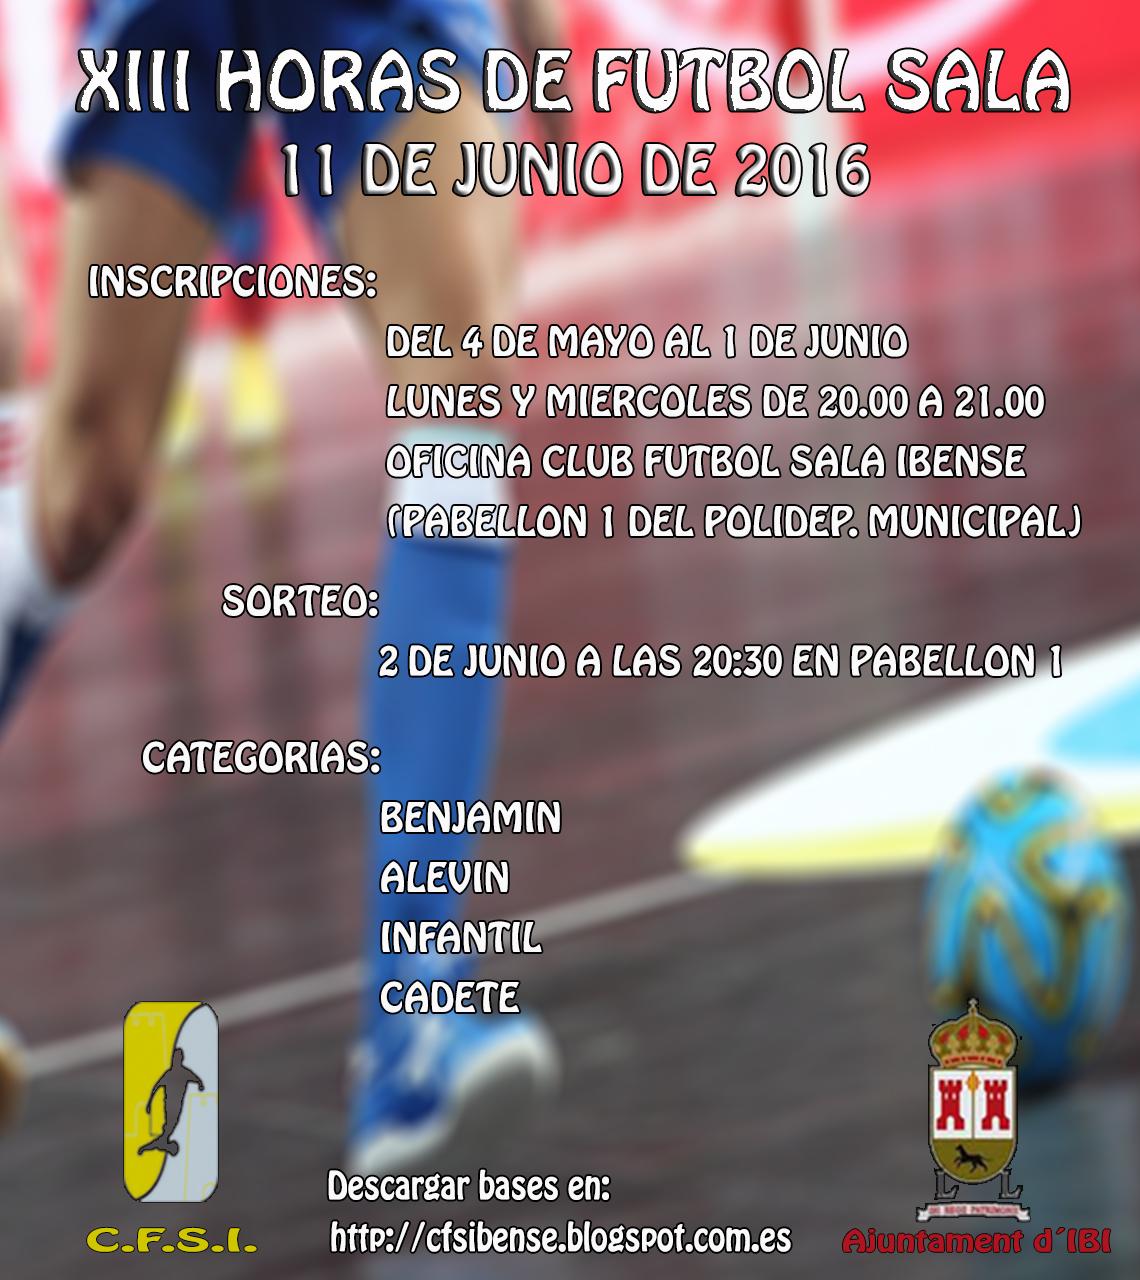 XIII HORAS FÚTBOL SALA 11 JUNIO 2016